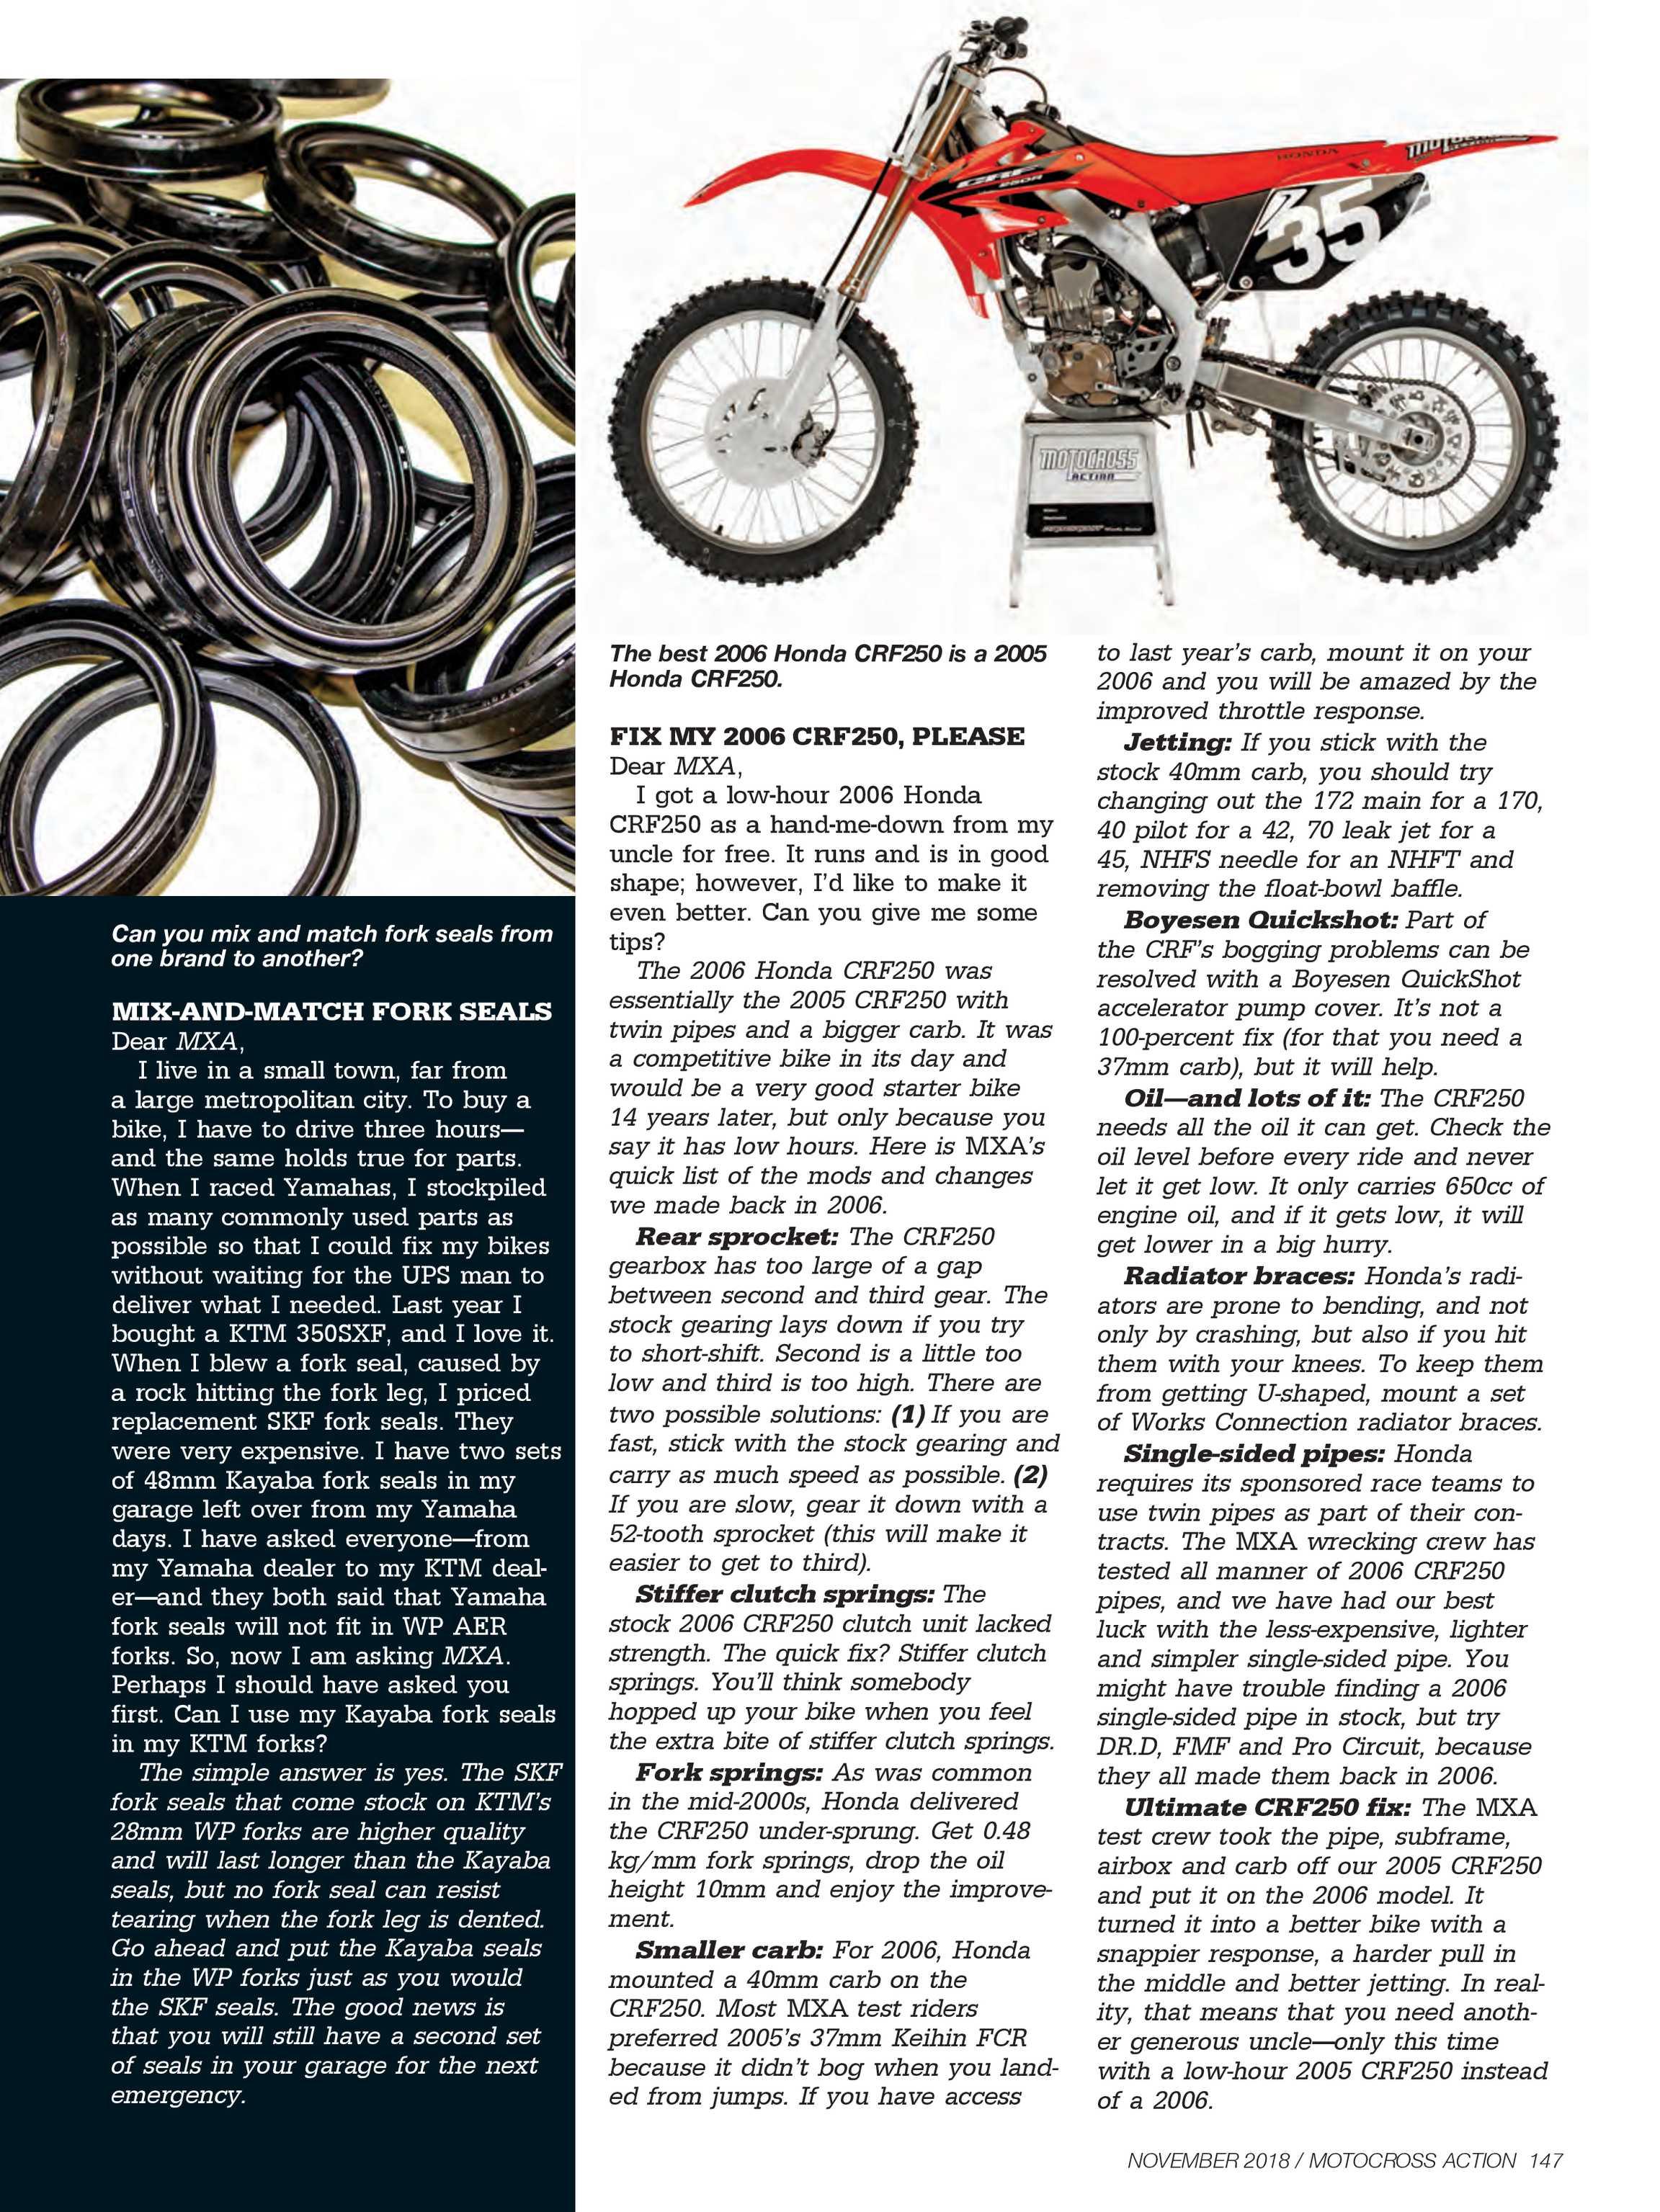 Motocross Action Magazine - November 2018 - page 146